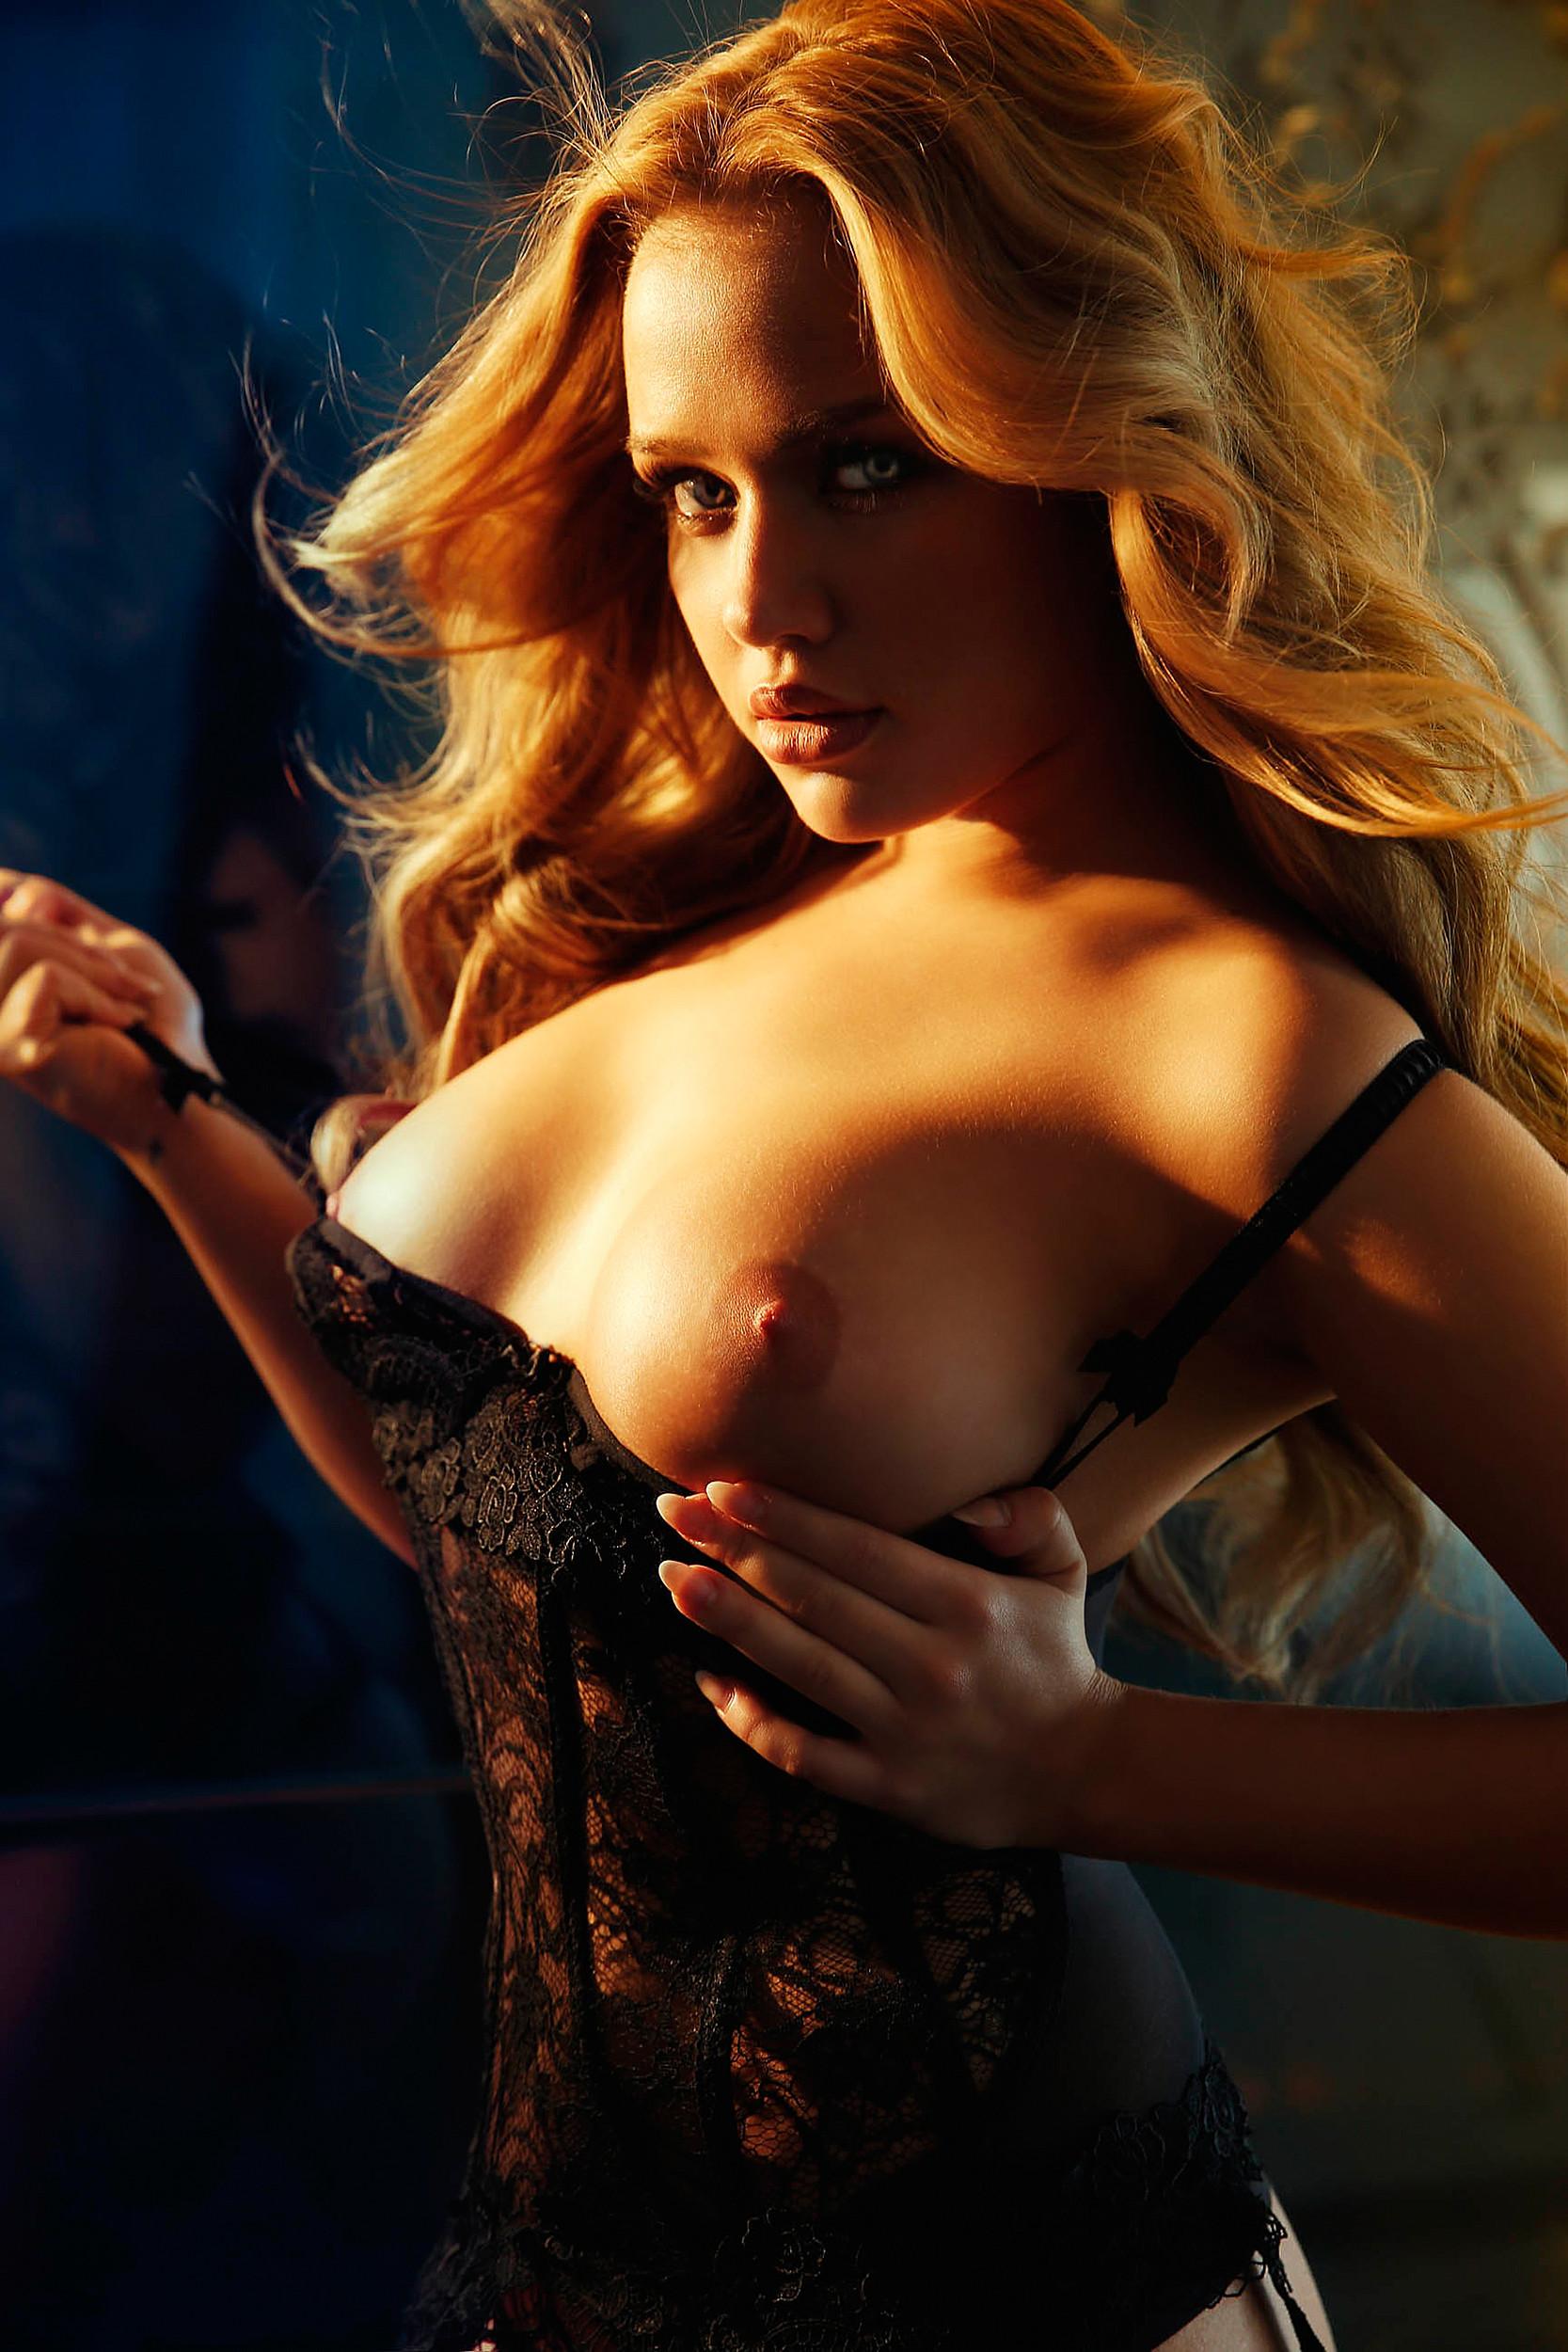 Kim richards nude photos or videos think